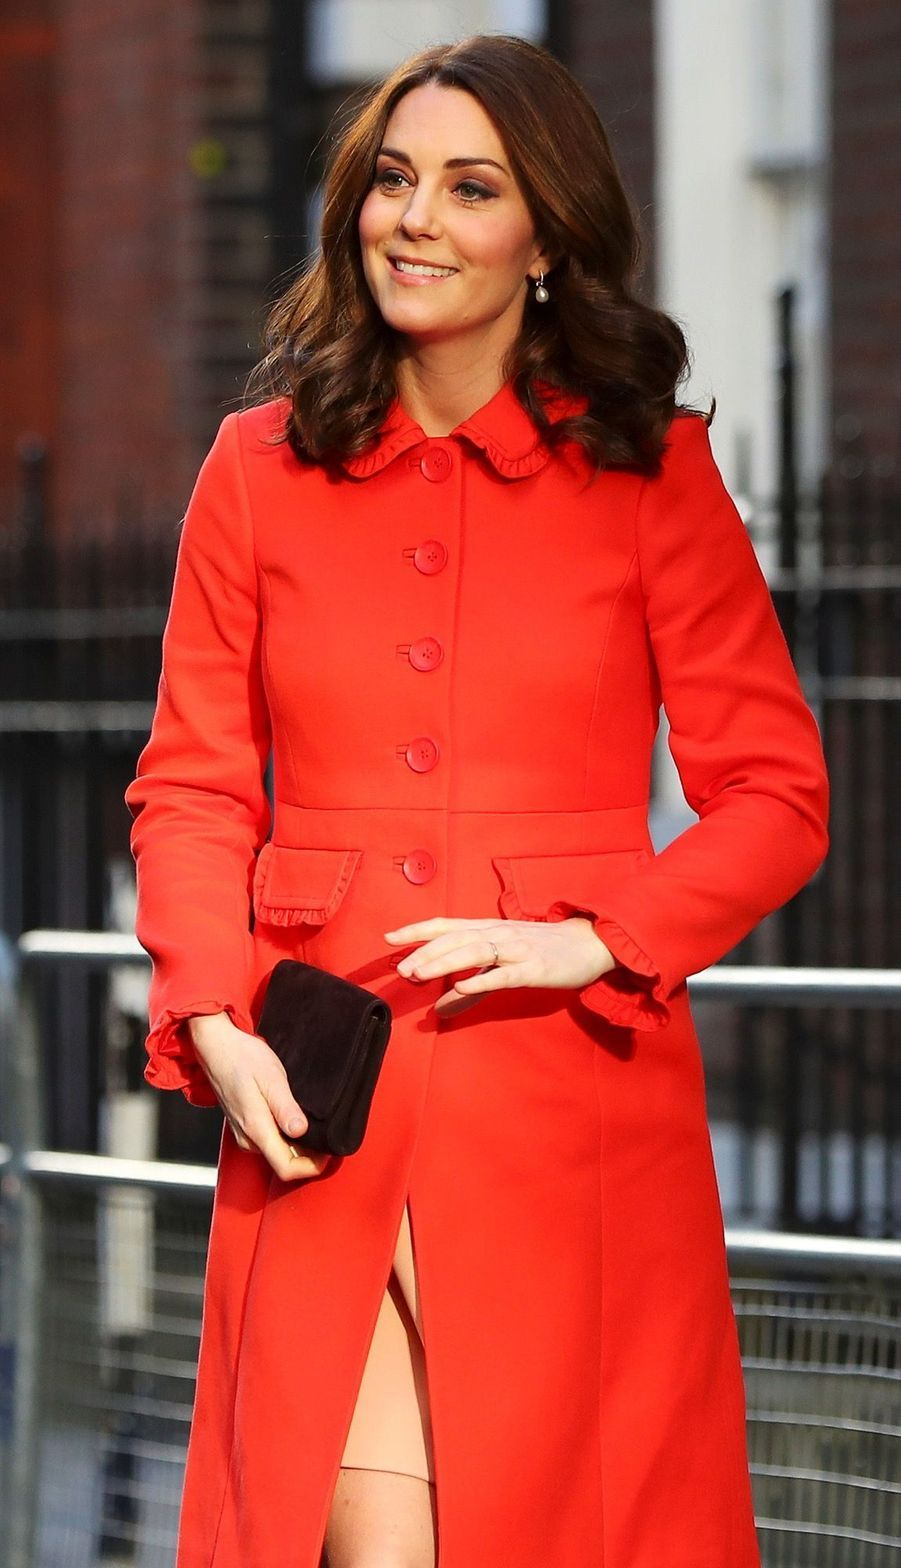 Kate Middleton Enceinte Au Chevet De Rafael, Au Great Ormond Street Hospital 12